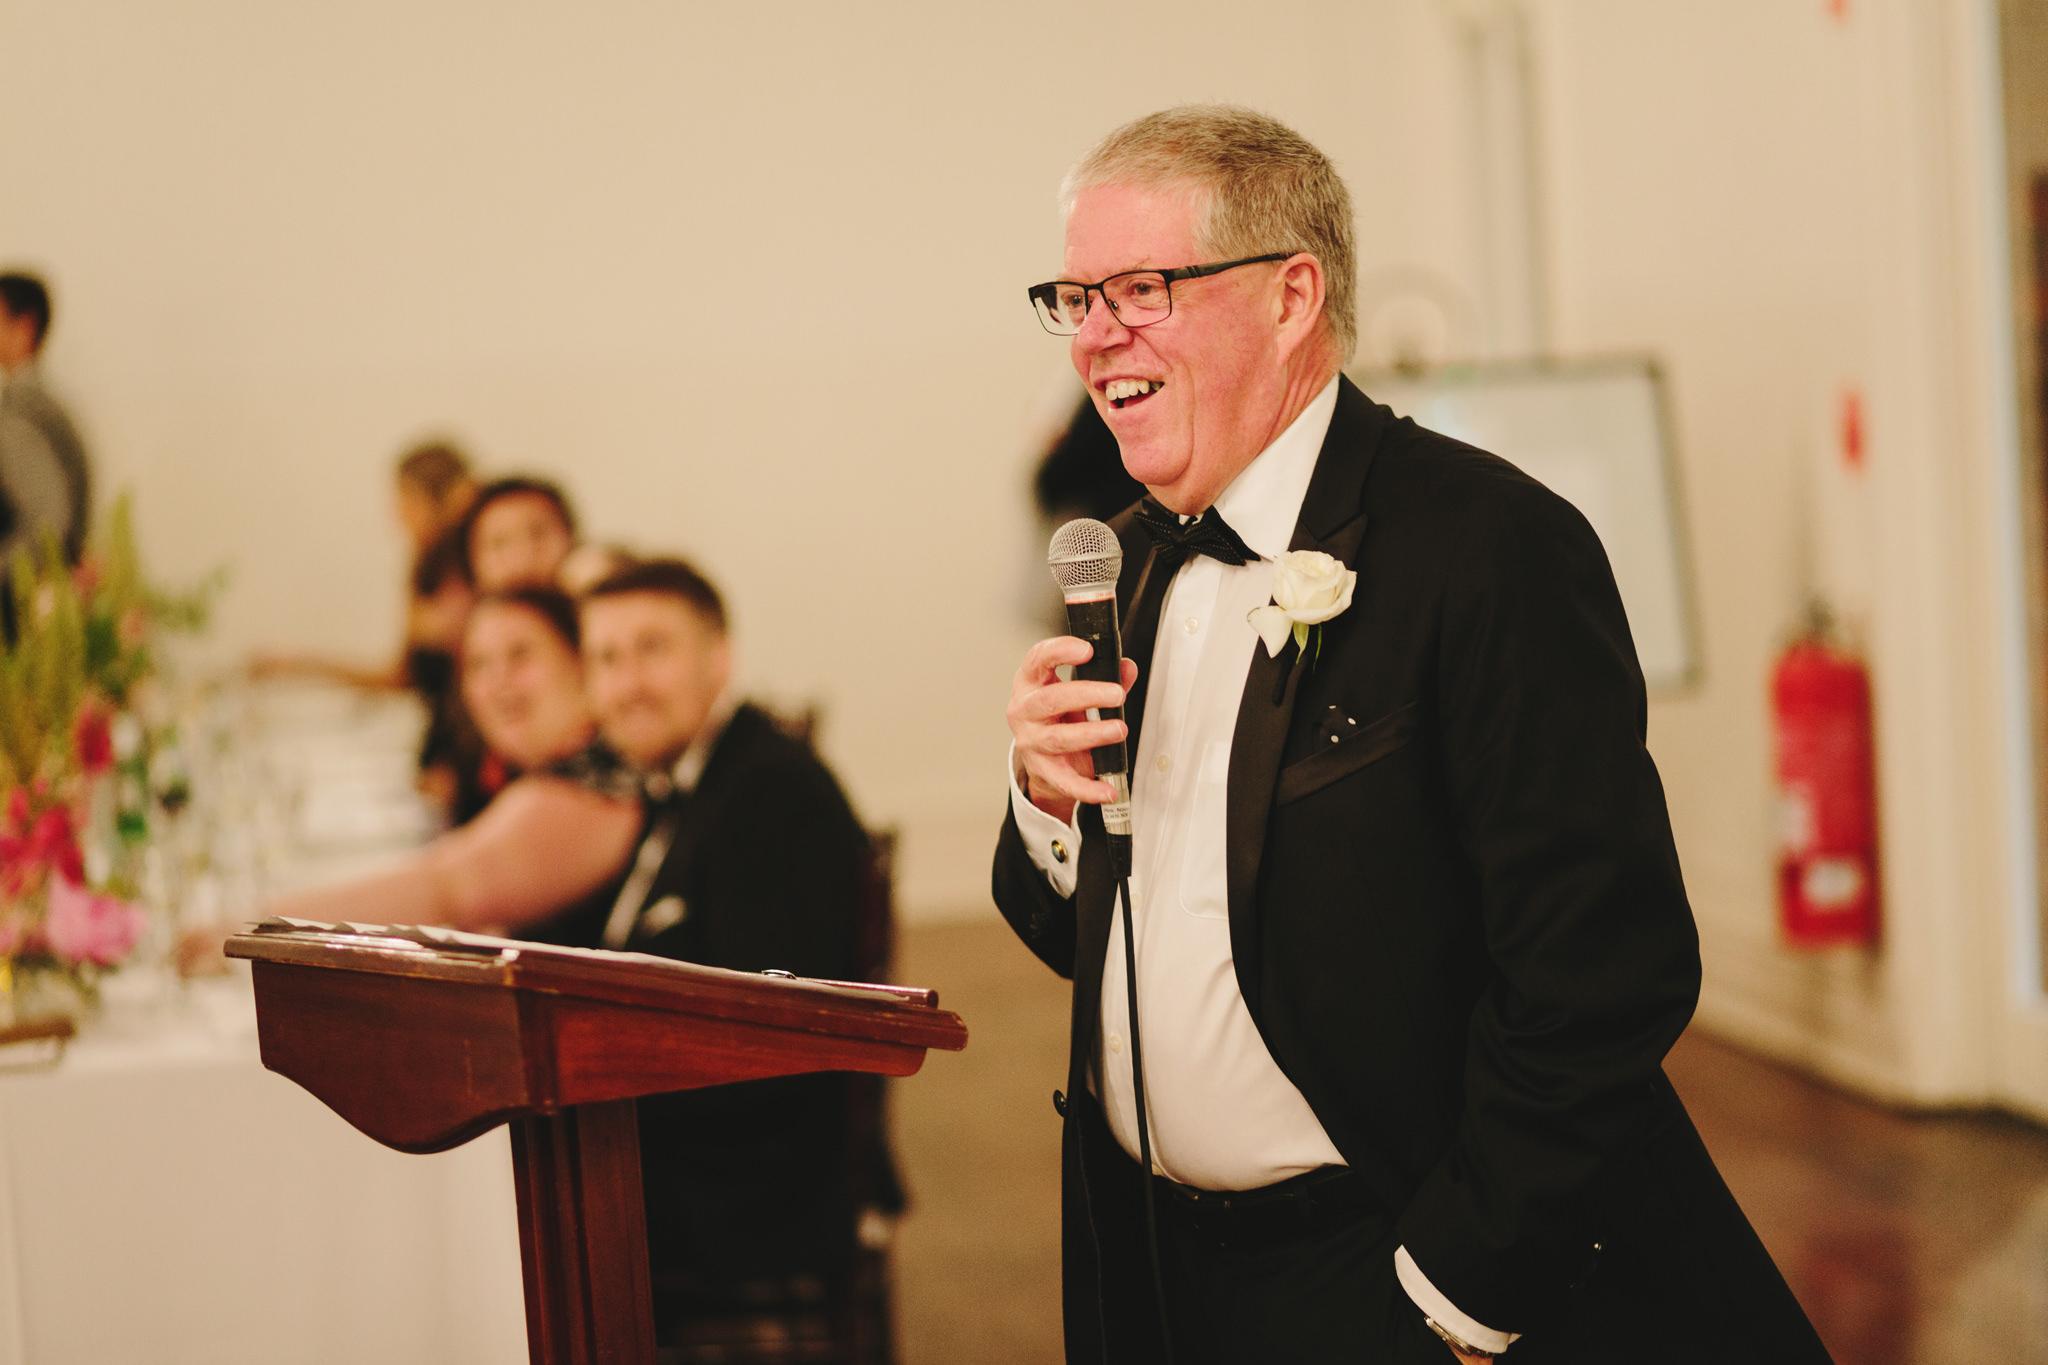 Abbotsford_Convent_Wedding_Peter_Anna108.JPG